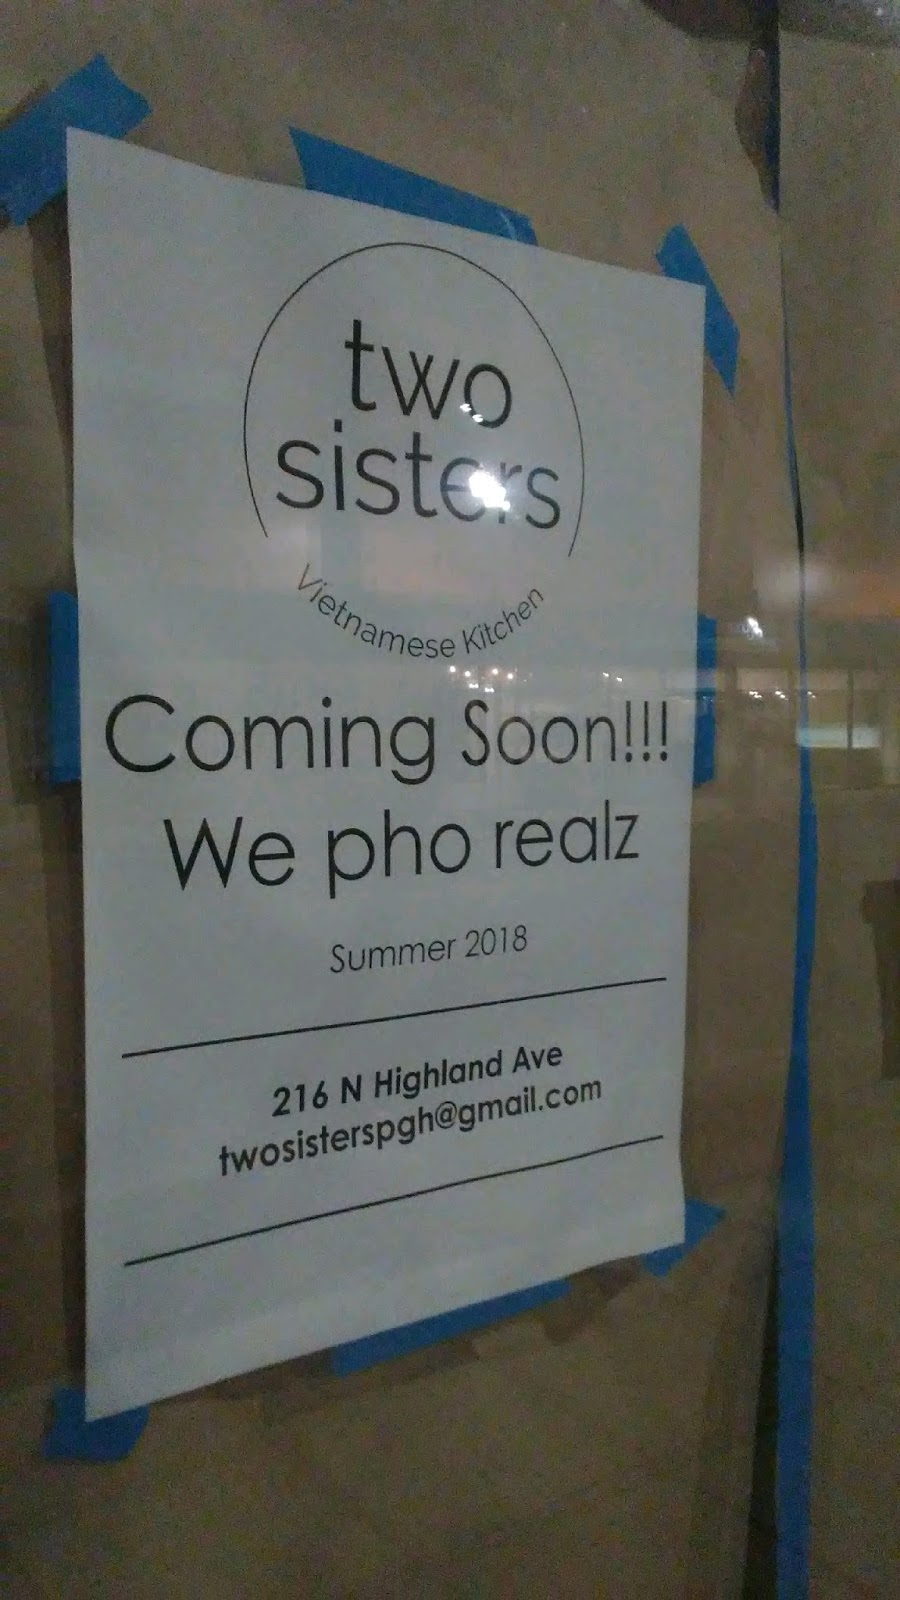 Pennsylvasia Progress On Two Sisters Vietnamese Kitchen